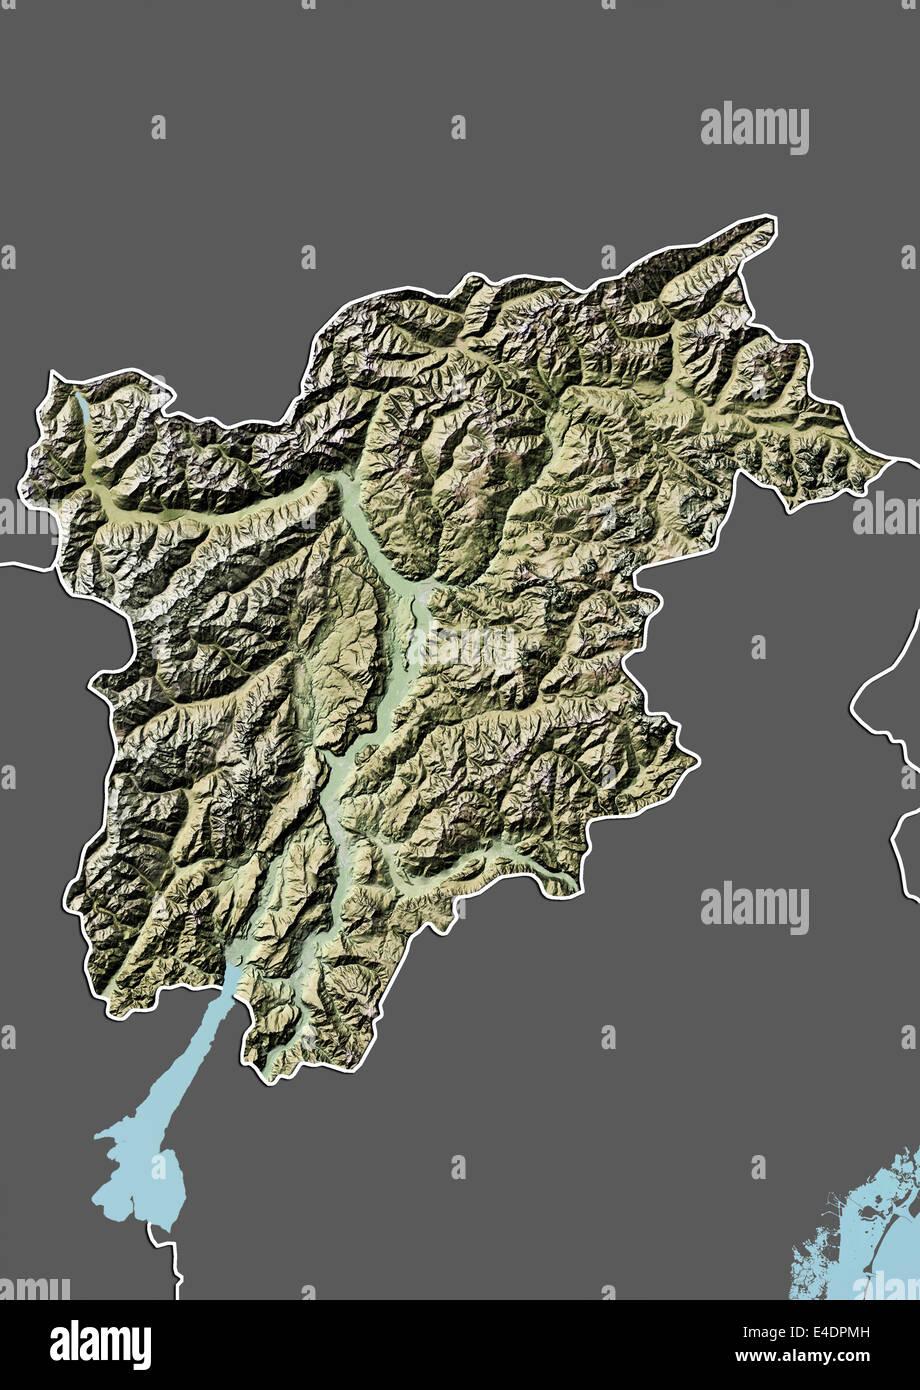 Region of TrentinoAlto Adige Italy Relief Map Stock Photo